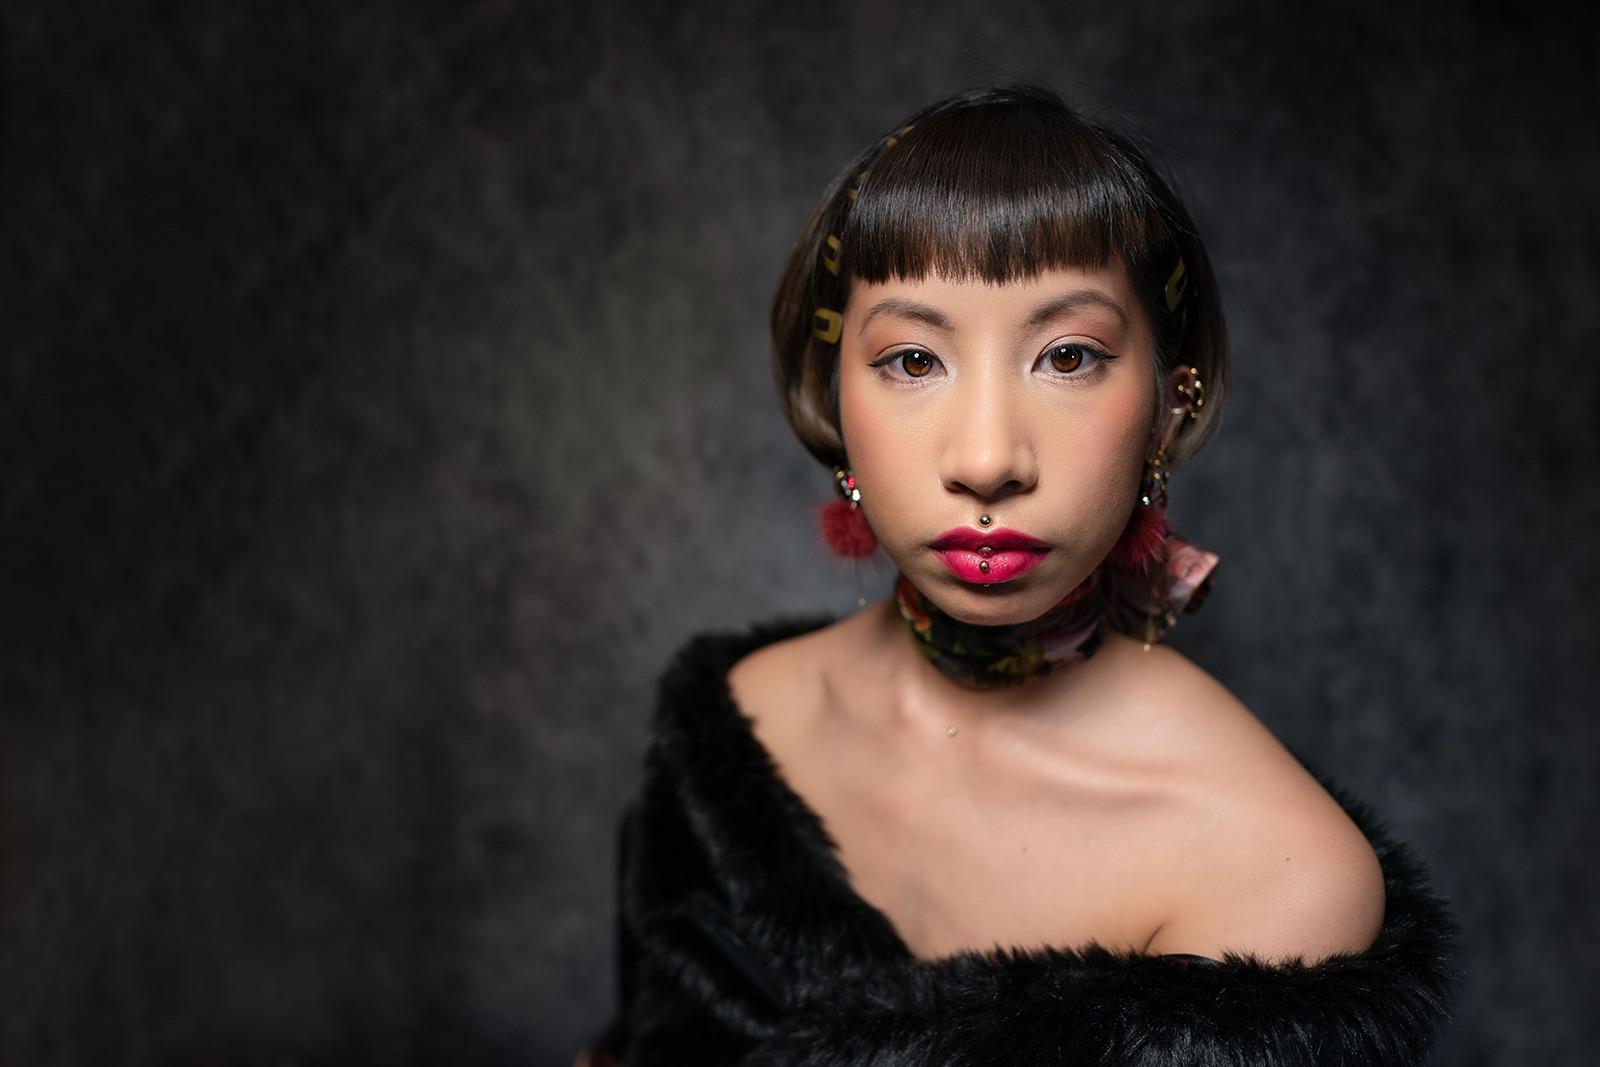 Sample portrait image with SEL2018 lens